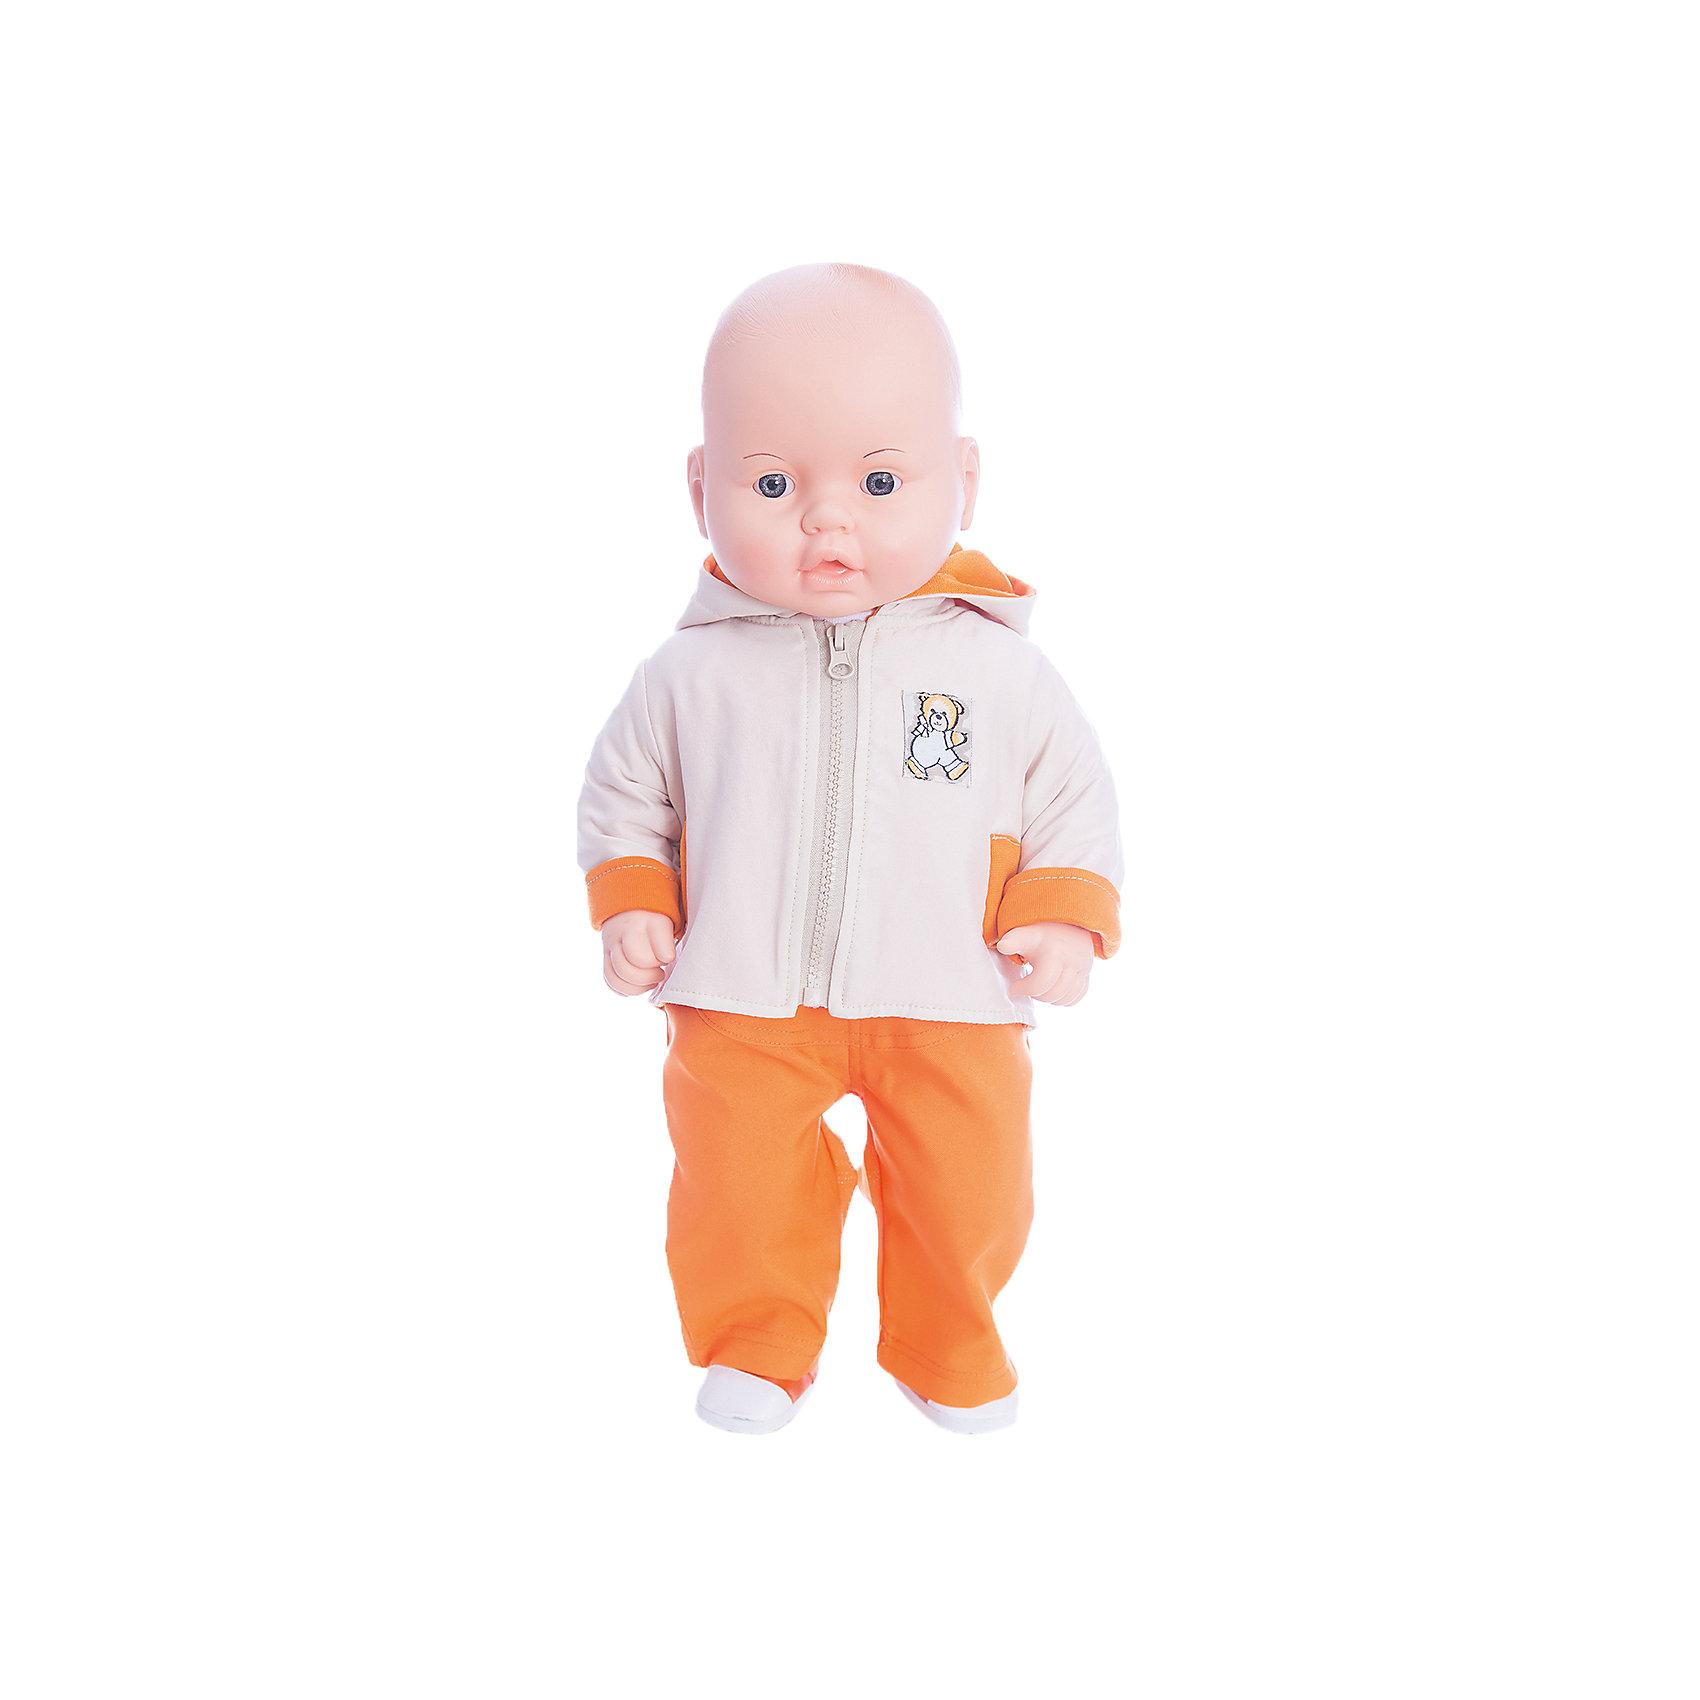 Кукла Владик 3, Весна<br><br>Ширина мм: 590<br>Глубина мм: 240<br>Высота мм: 150<br>Вес г: 730<br>Возраст от месяцев: 36<br>Возраст до месяцев: 144<br>Пол: Женский<br>Возраст: Детский<br>SKU: 4896489